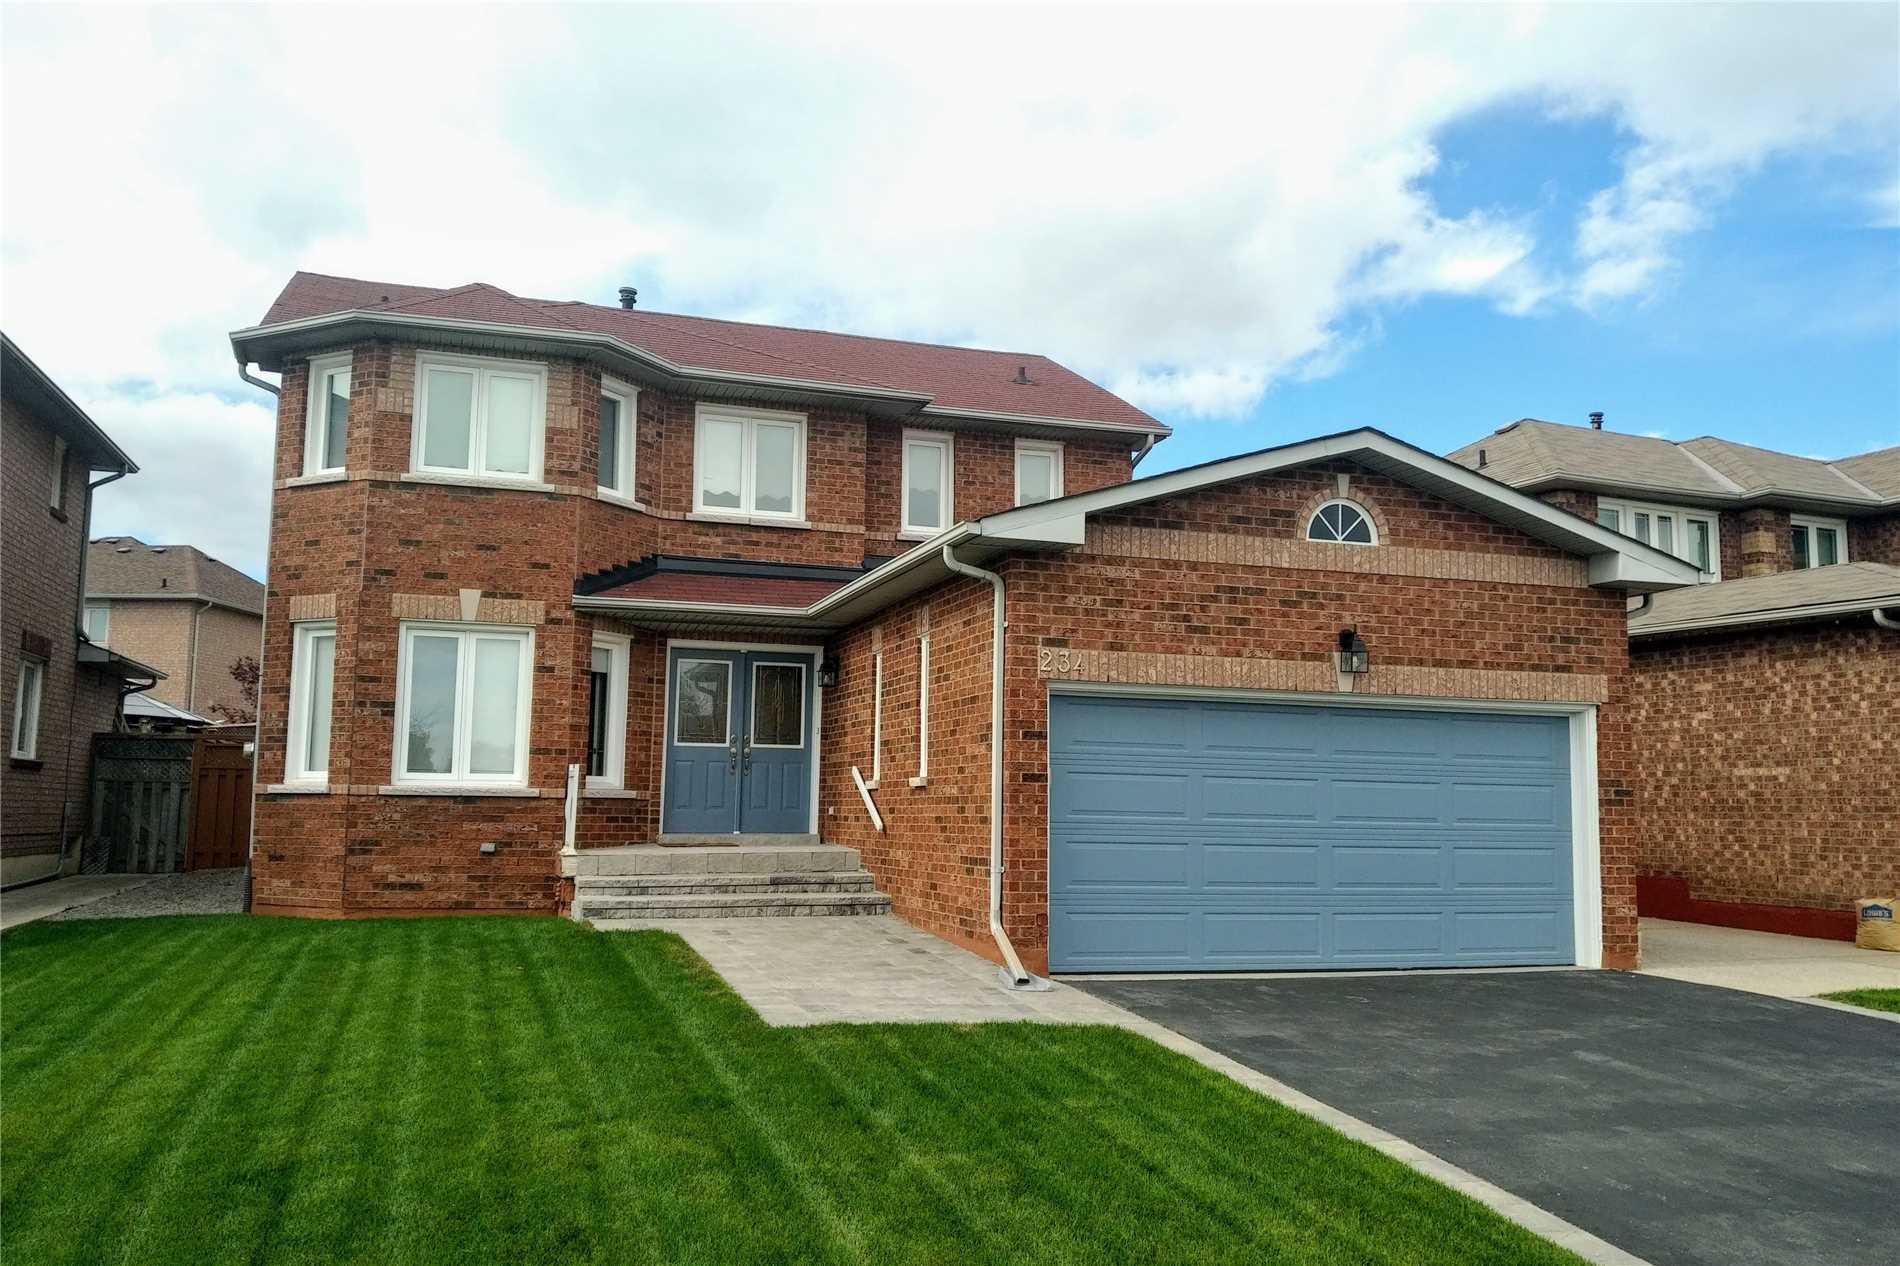 House for sale at 234 Melville Avenue Vaughan Ontario - MLS: N4309528